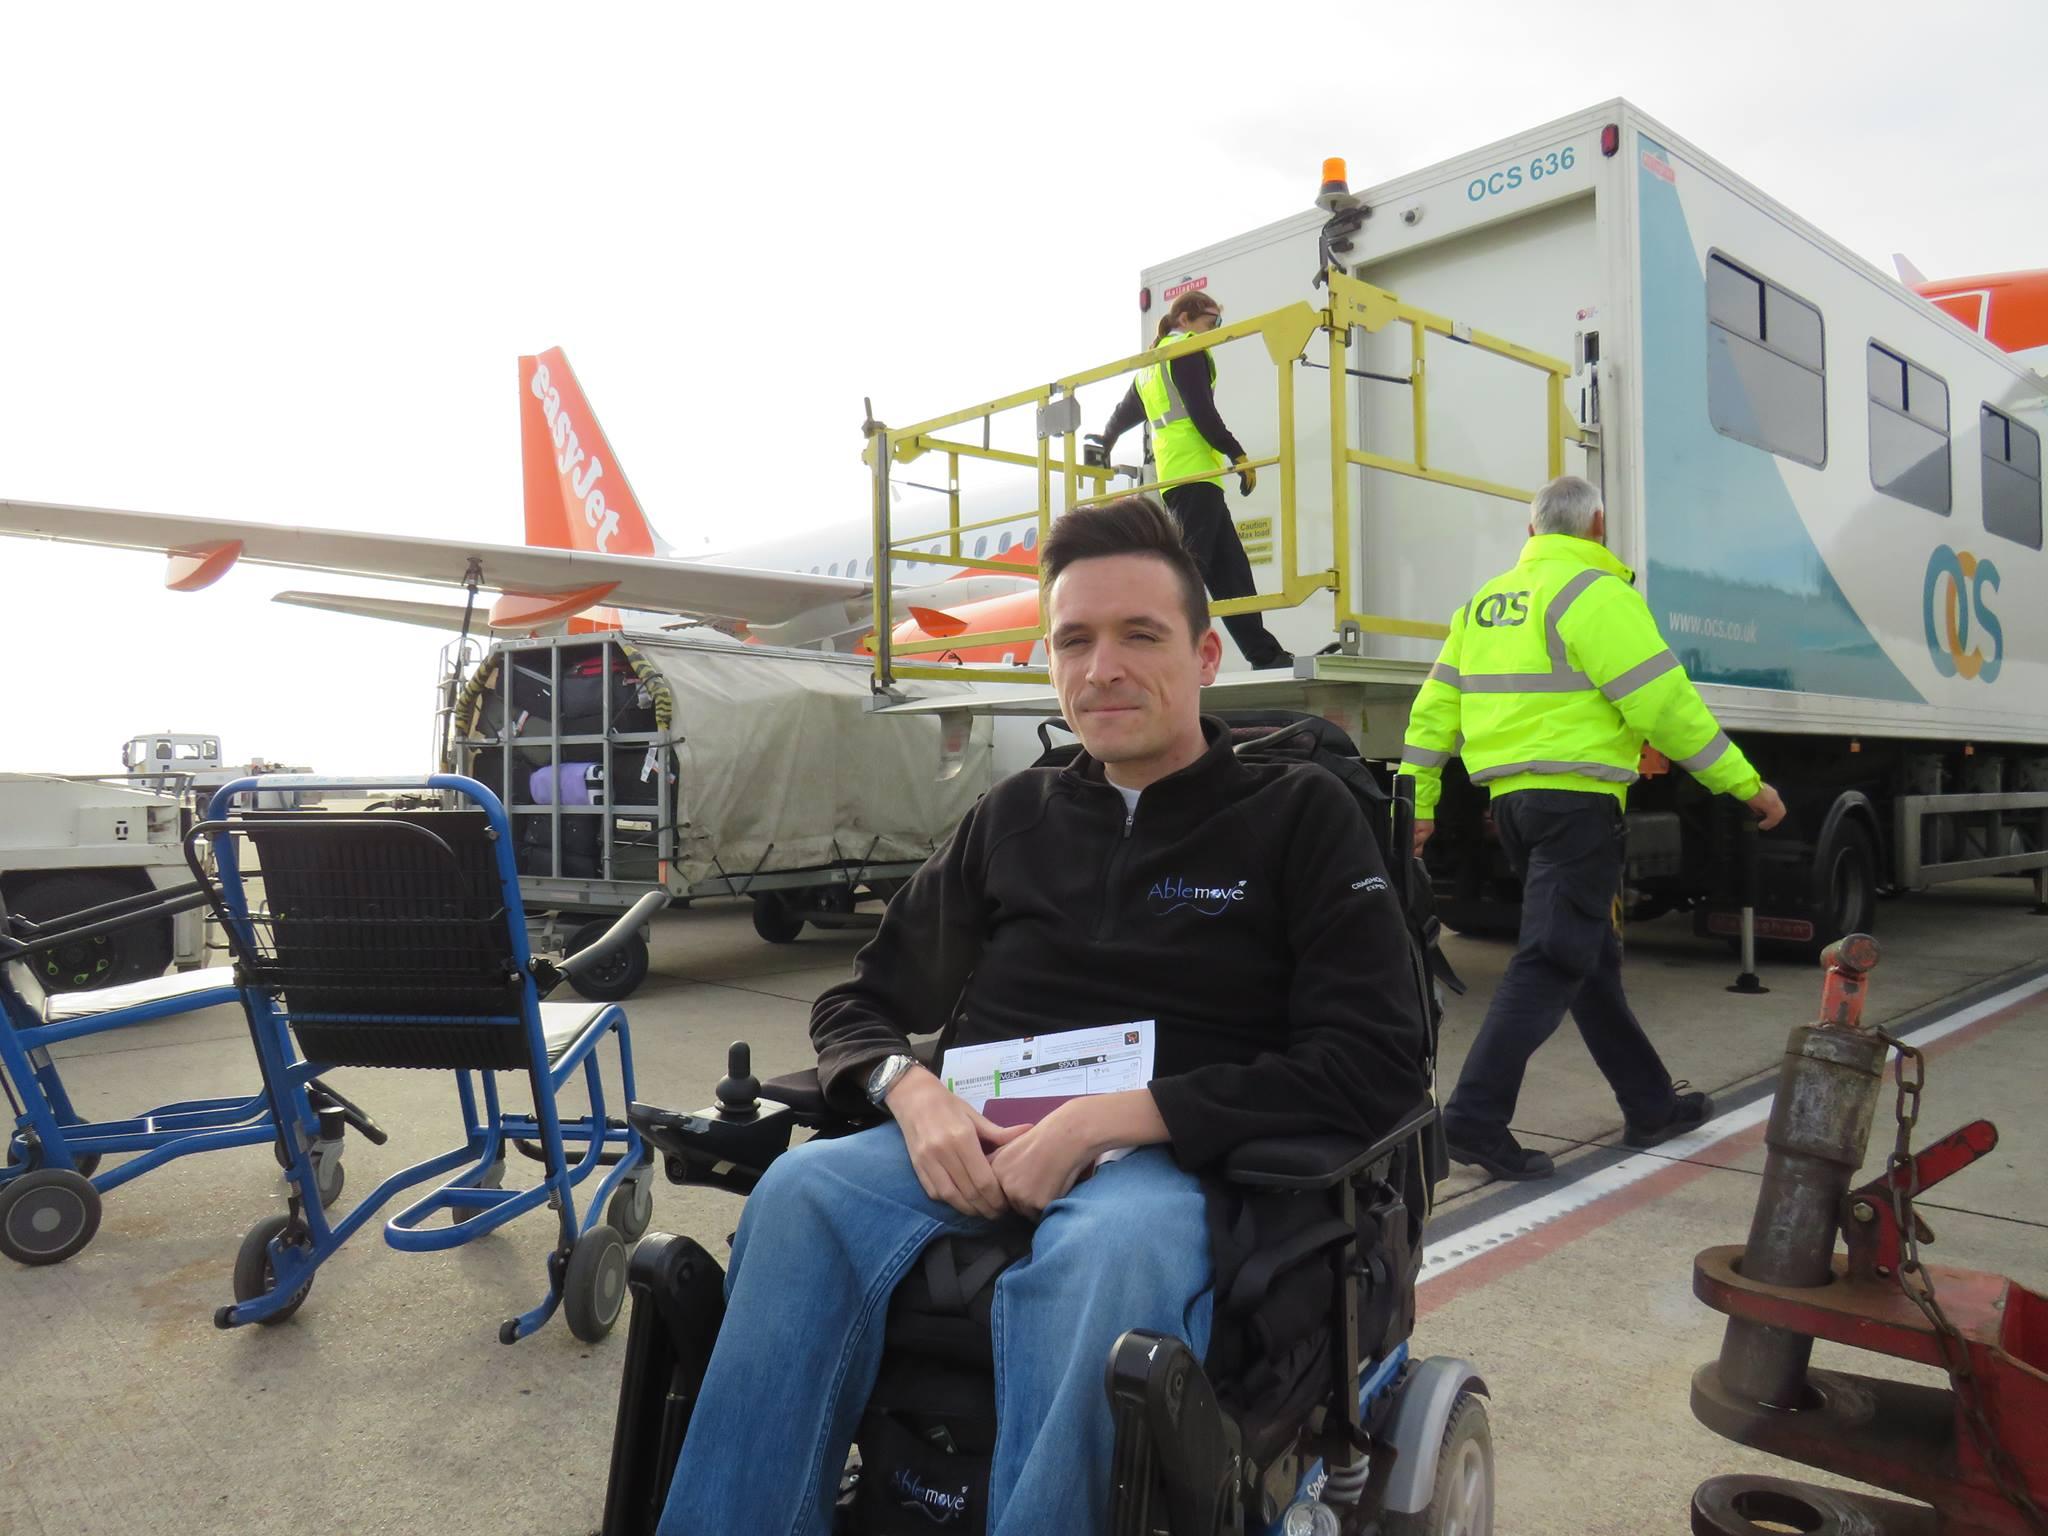 Josh Wintersgill before embarkation